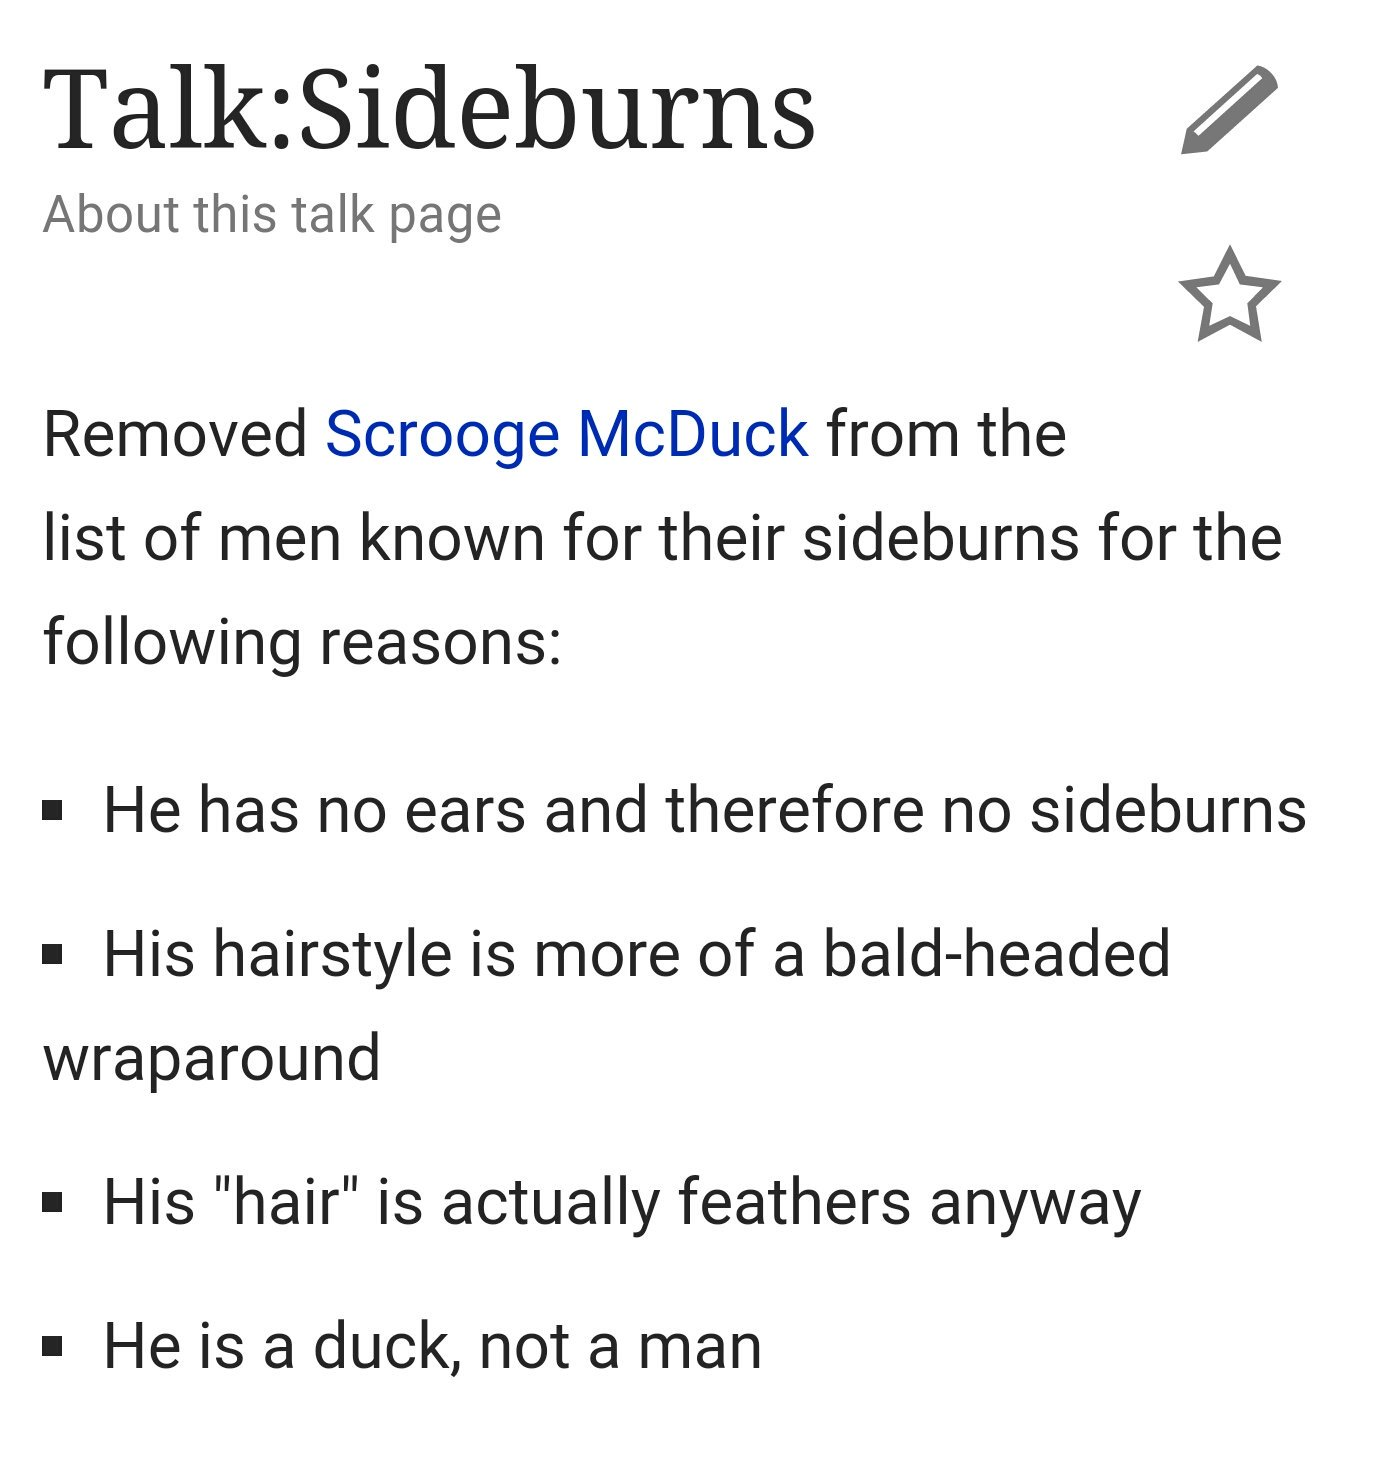 RT @tombomp: I love wikipedia https://t.co/1zxknQPX1N